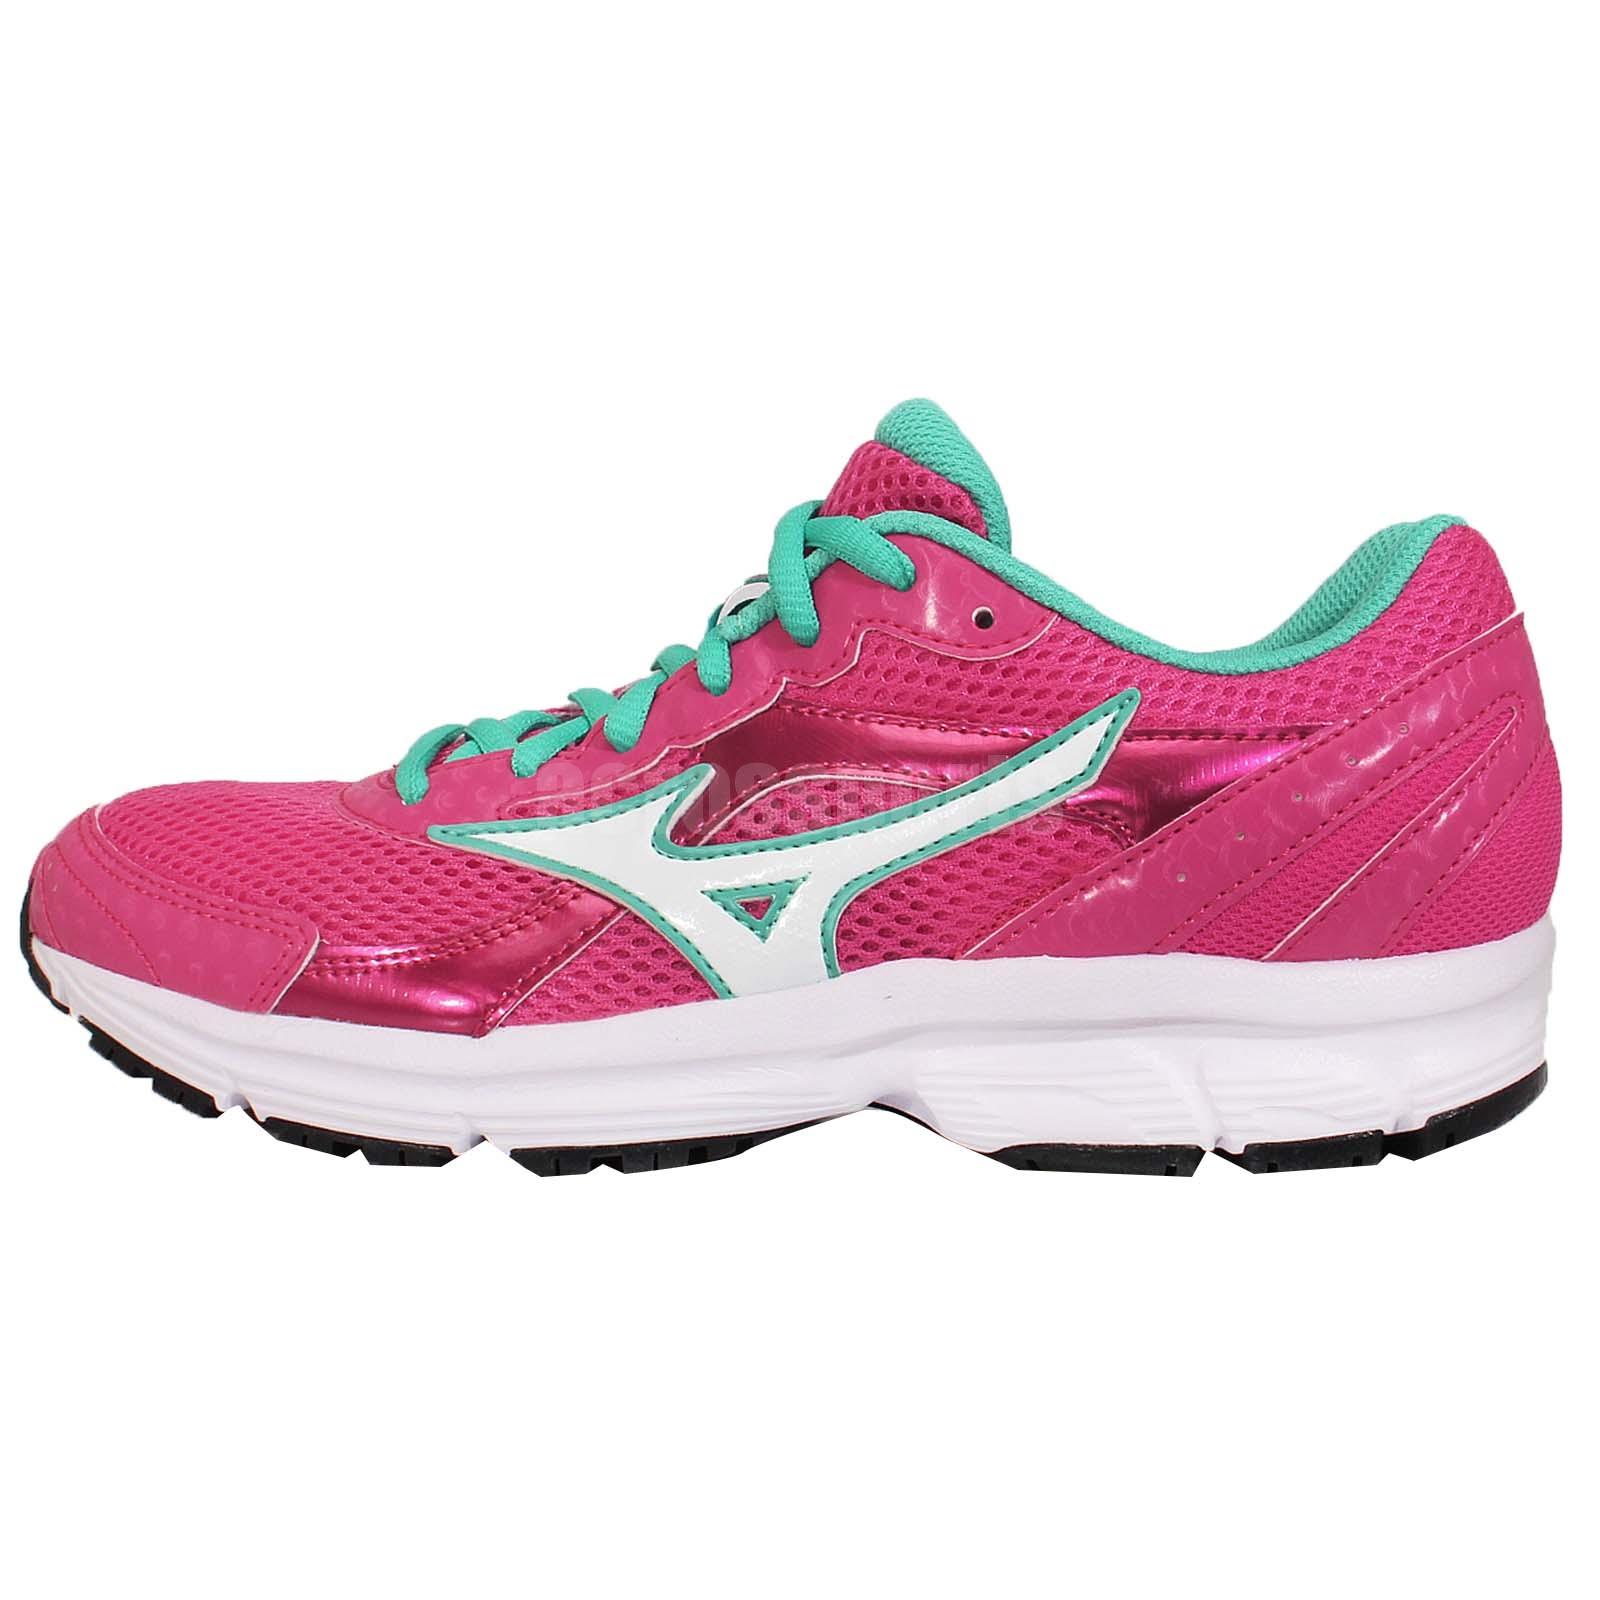 mizuno crusader 9 w pink green womens running